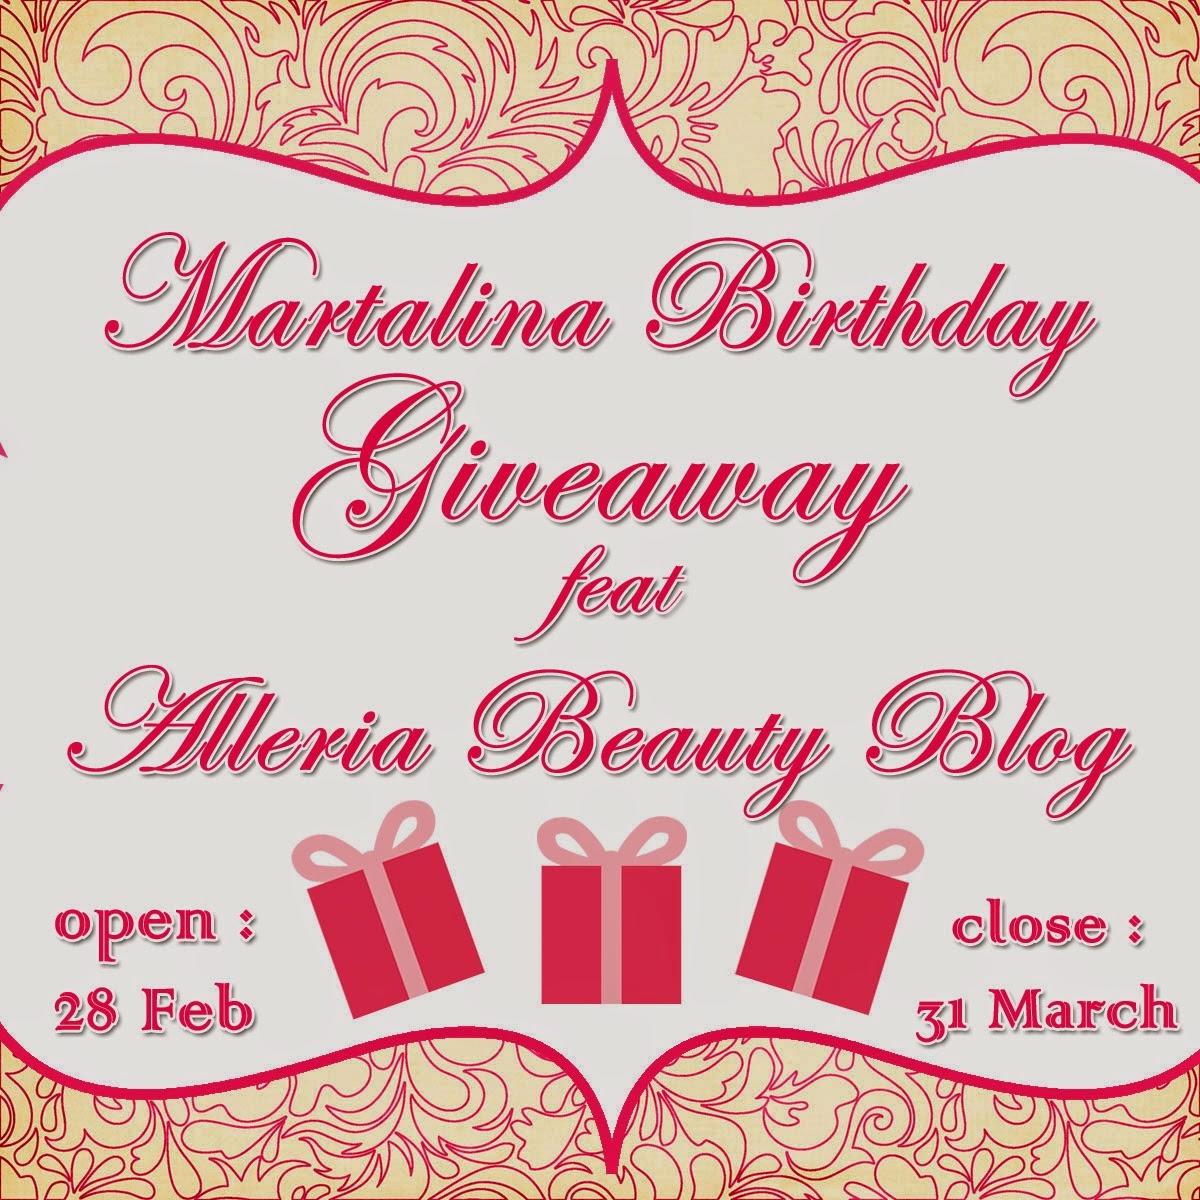 http://alleriamakeupartist.blogspot.com/2015/02/martalina-birthday-giveaway-feat.html